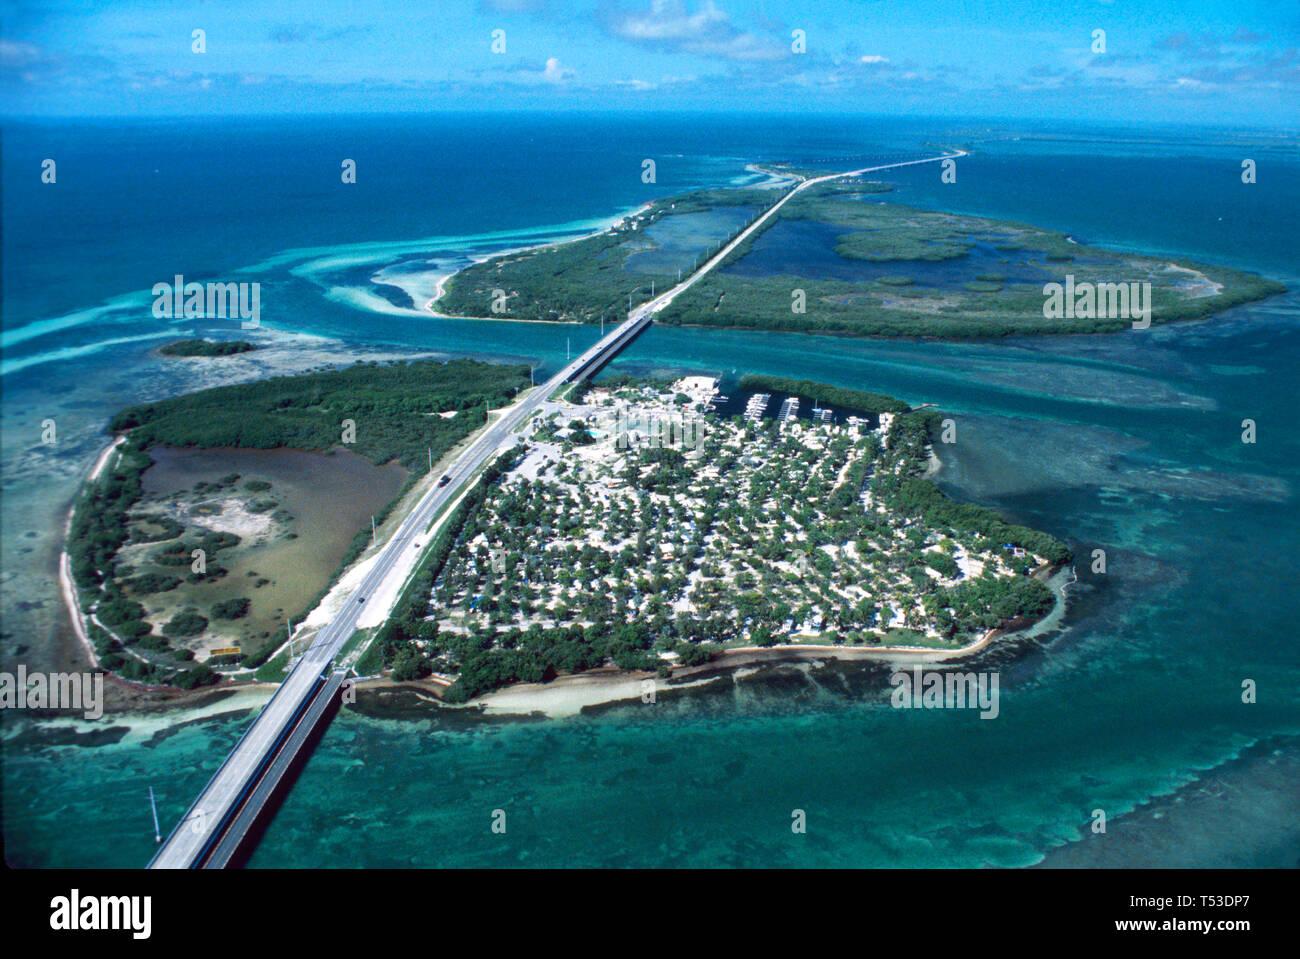 Florida Keys US Overseas Highway Route 1 Ohio Key,Bahia Honda Key State Park Gulf of Mexico Atlantic Ocean,aerial overhead view Florida Keys Wildlife Stock Photo